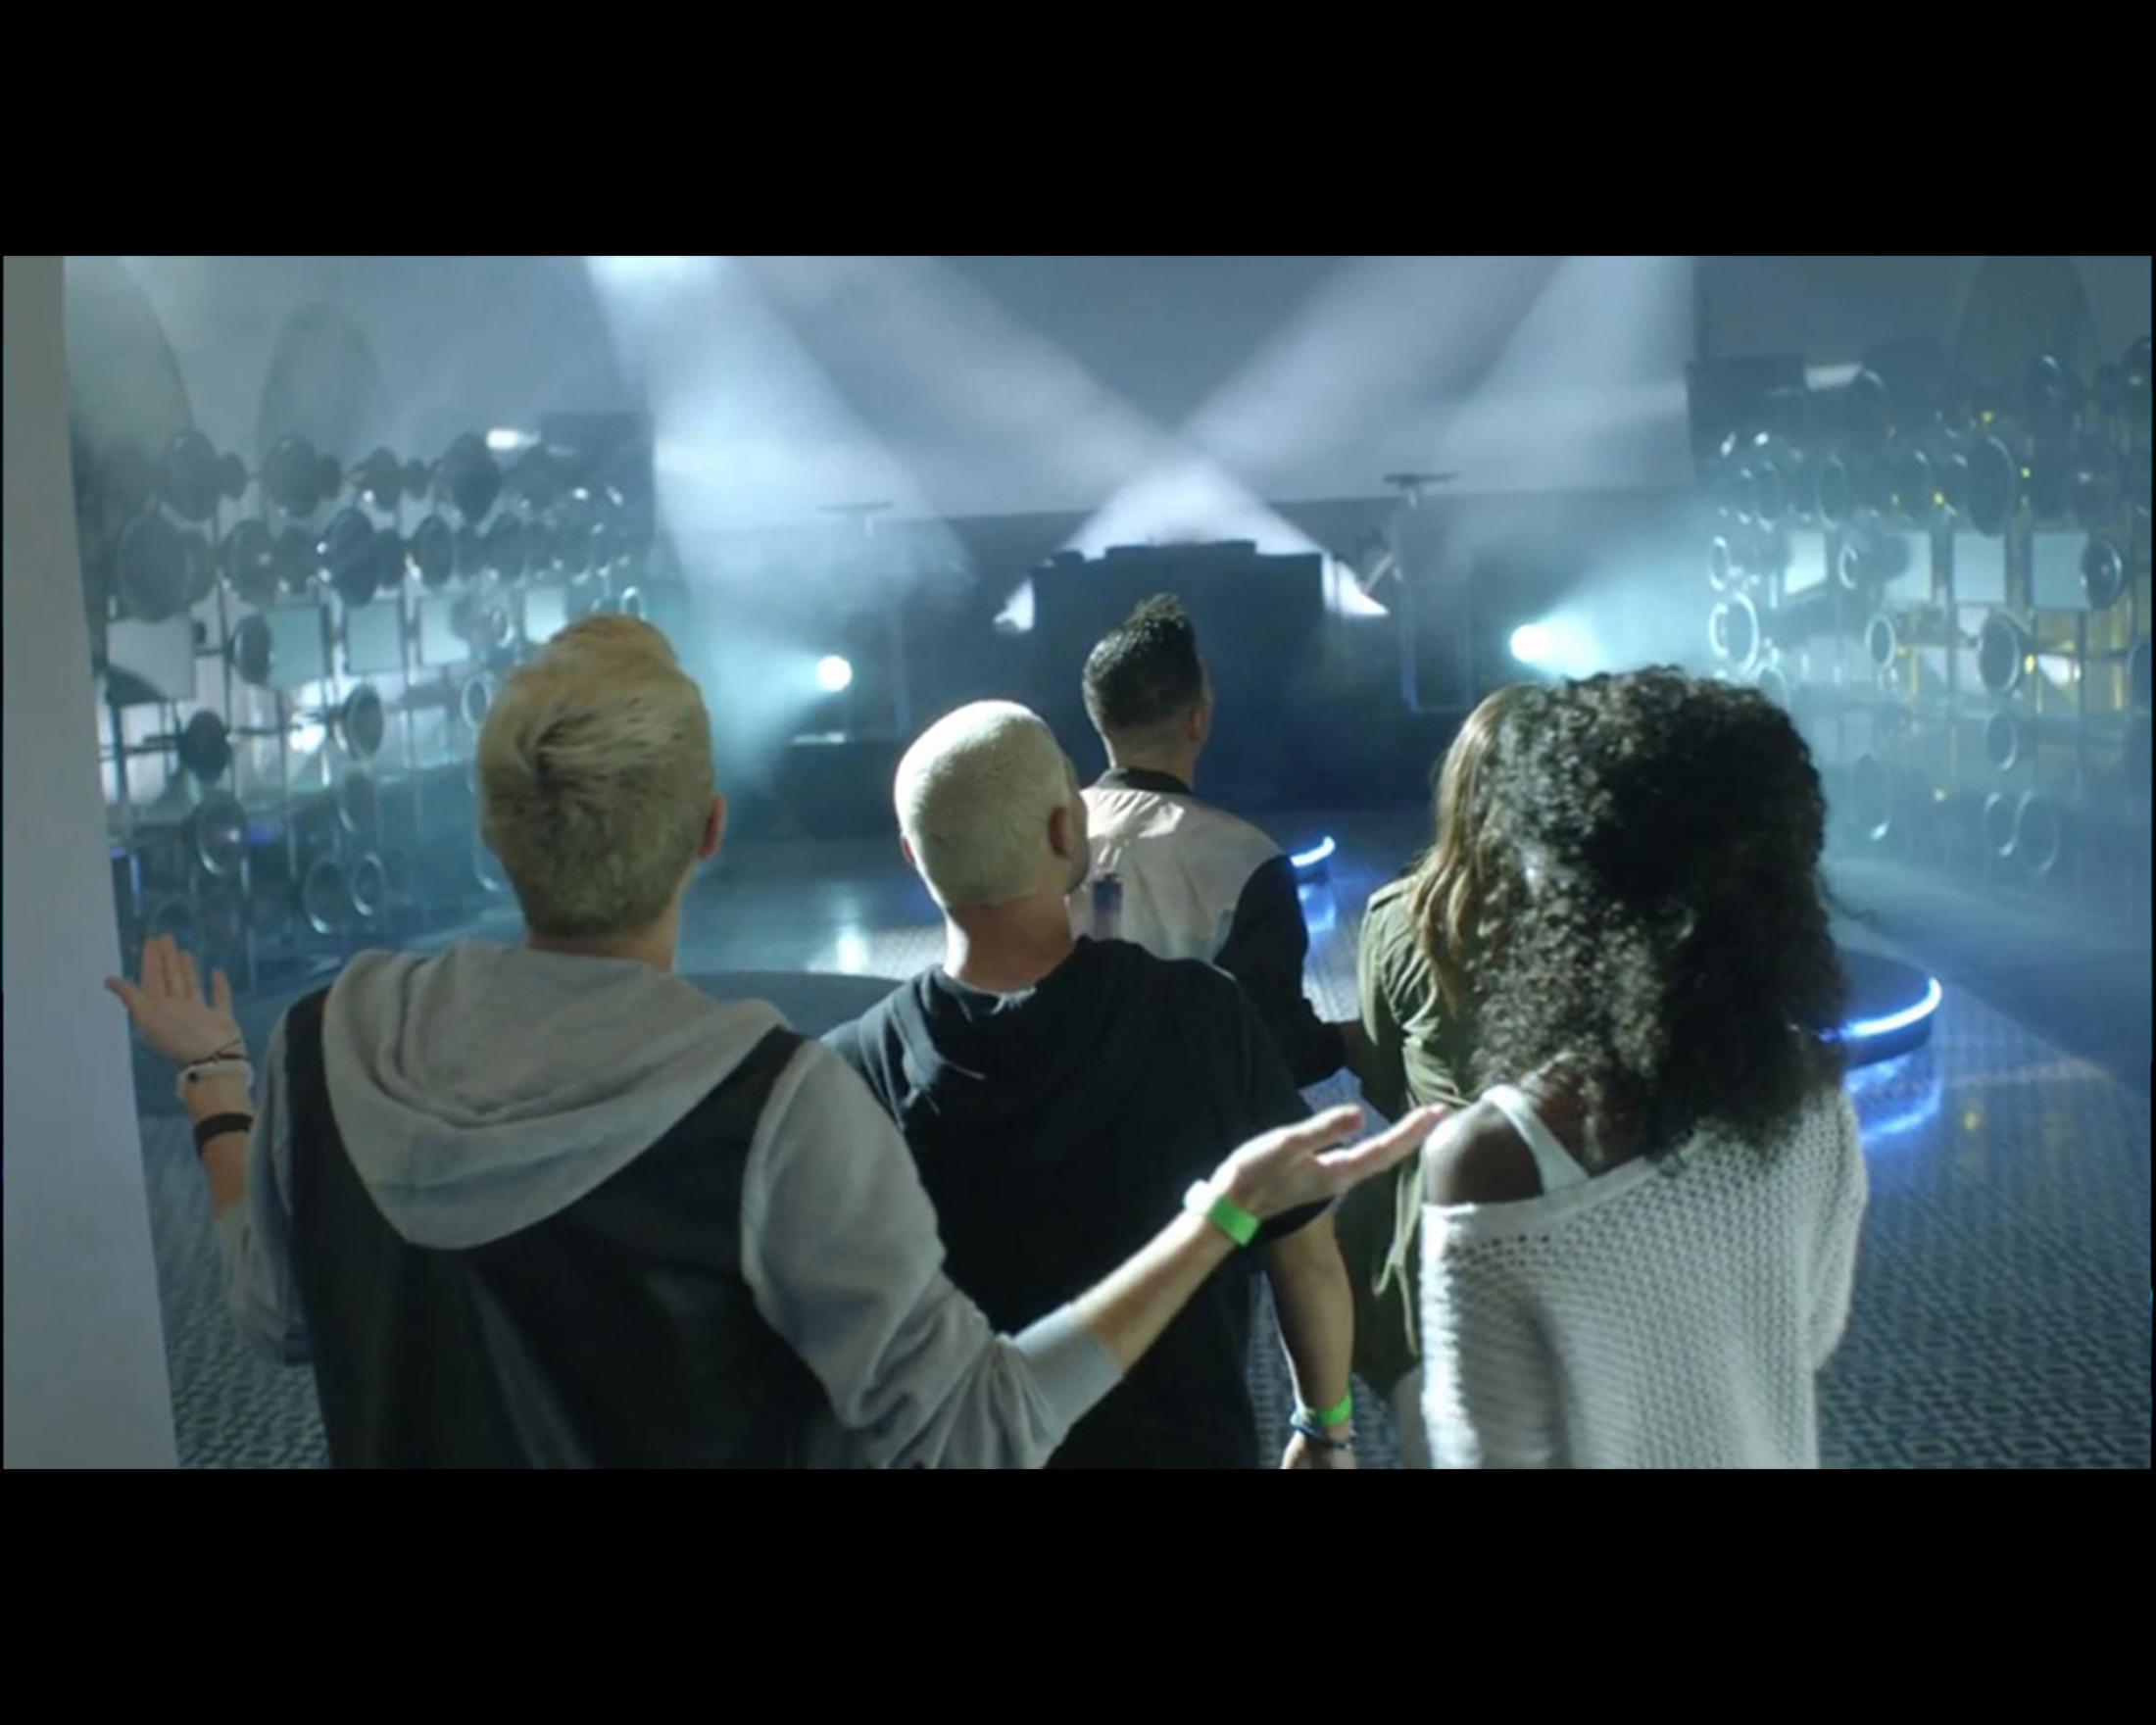 Thumbnail for Martin Garrix Concert For The Deaf